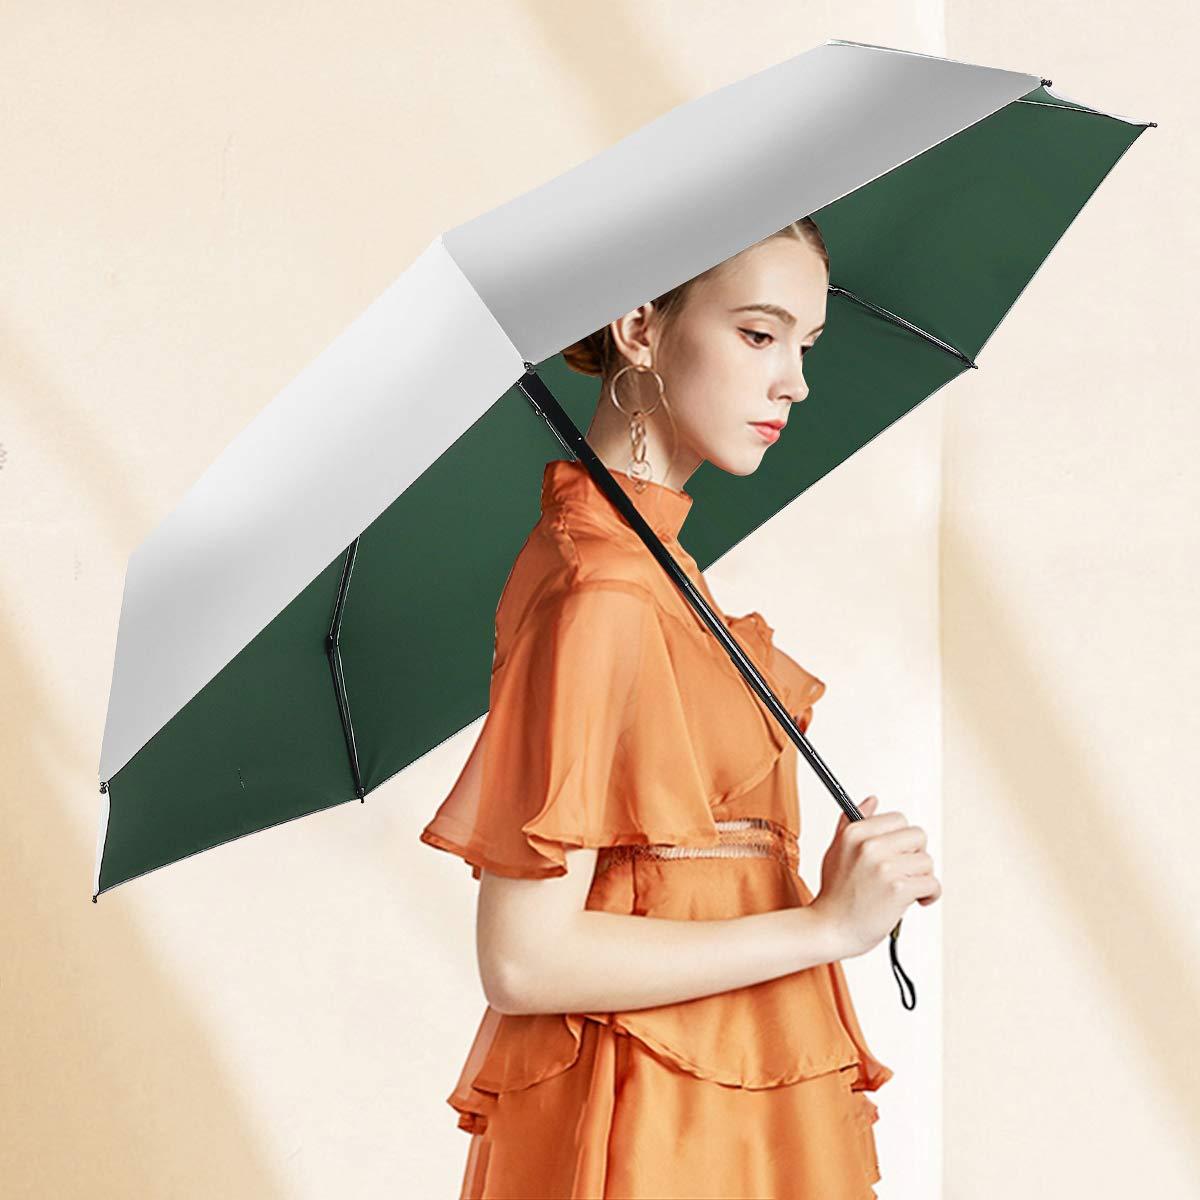 SUNEED Compact Travel Umbrella Mini UV Protection Umbrella Lightweight Mini Travel Umbrella Compact Small Folding Umbrella Rain /& Sun Portable Pocket Umbrella for Women Men Black